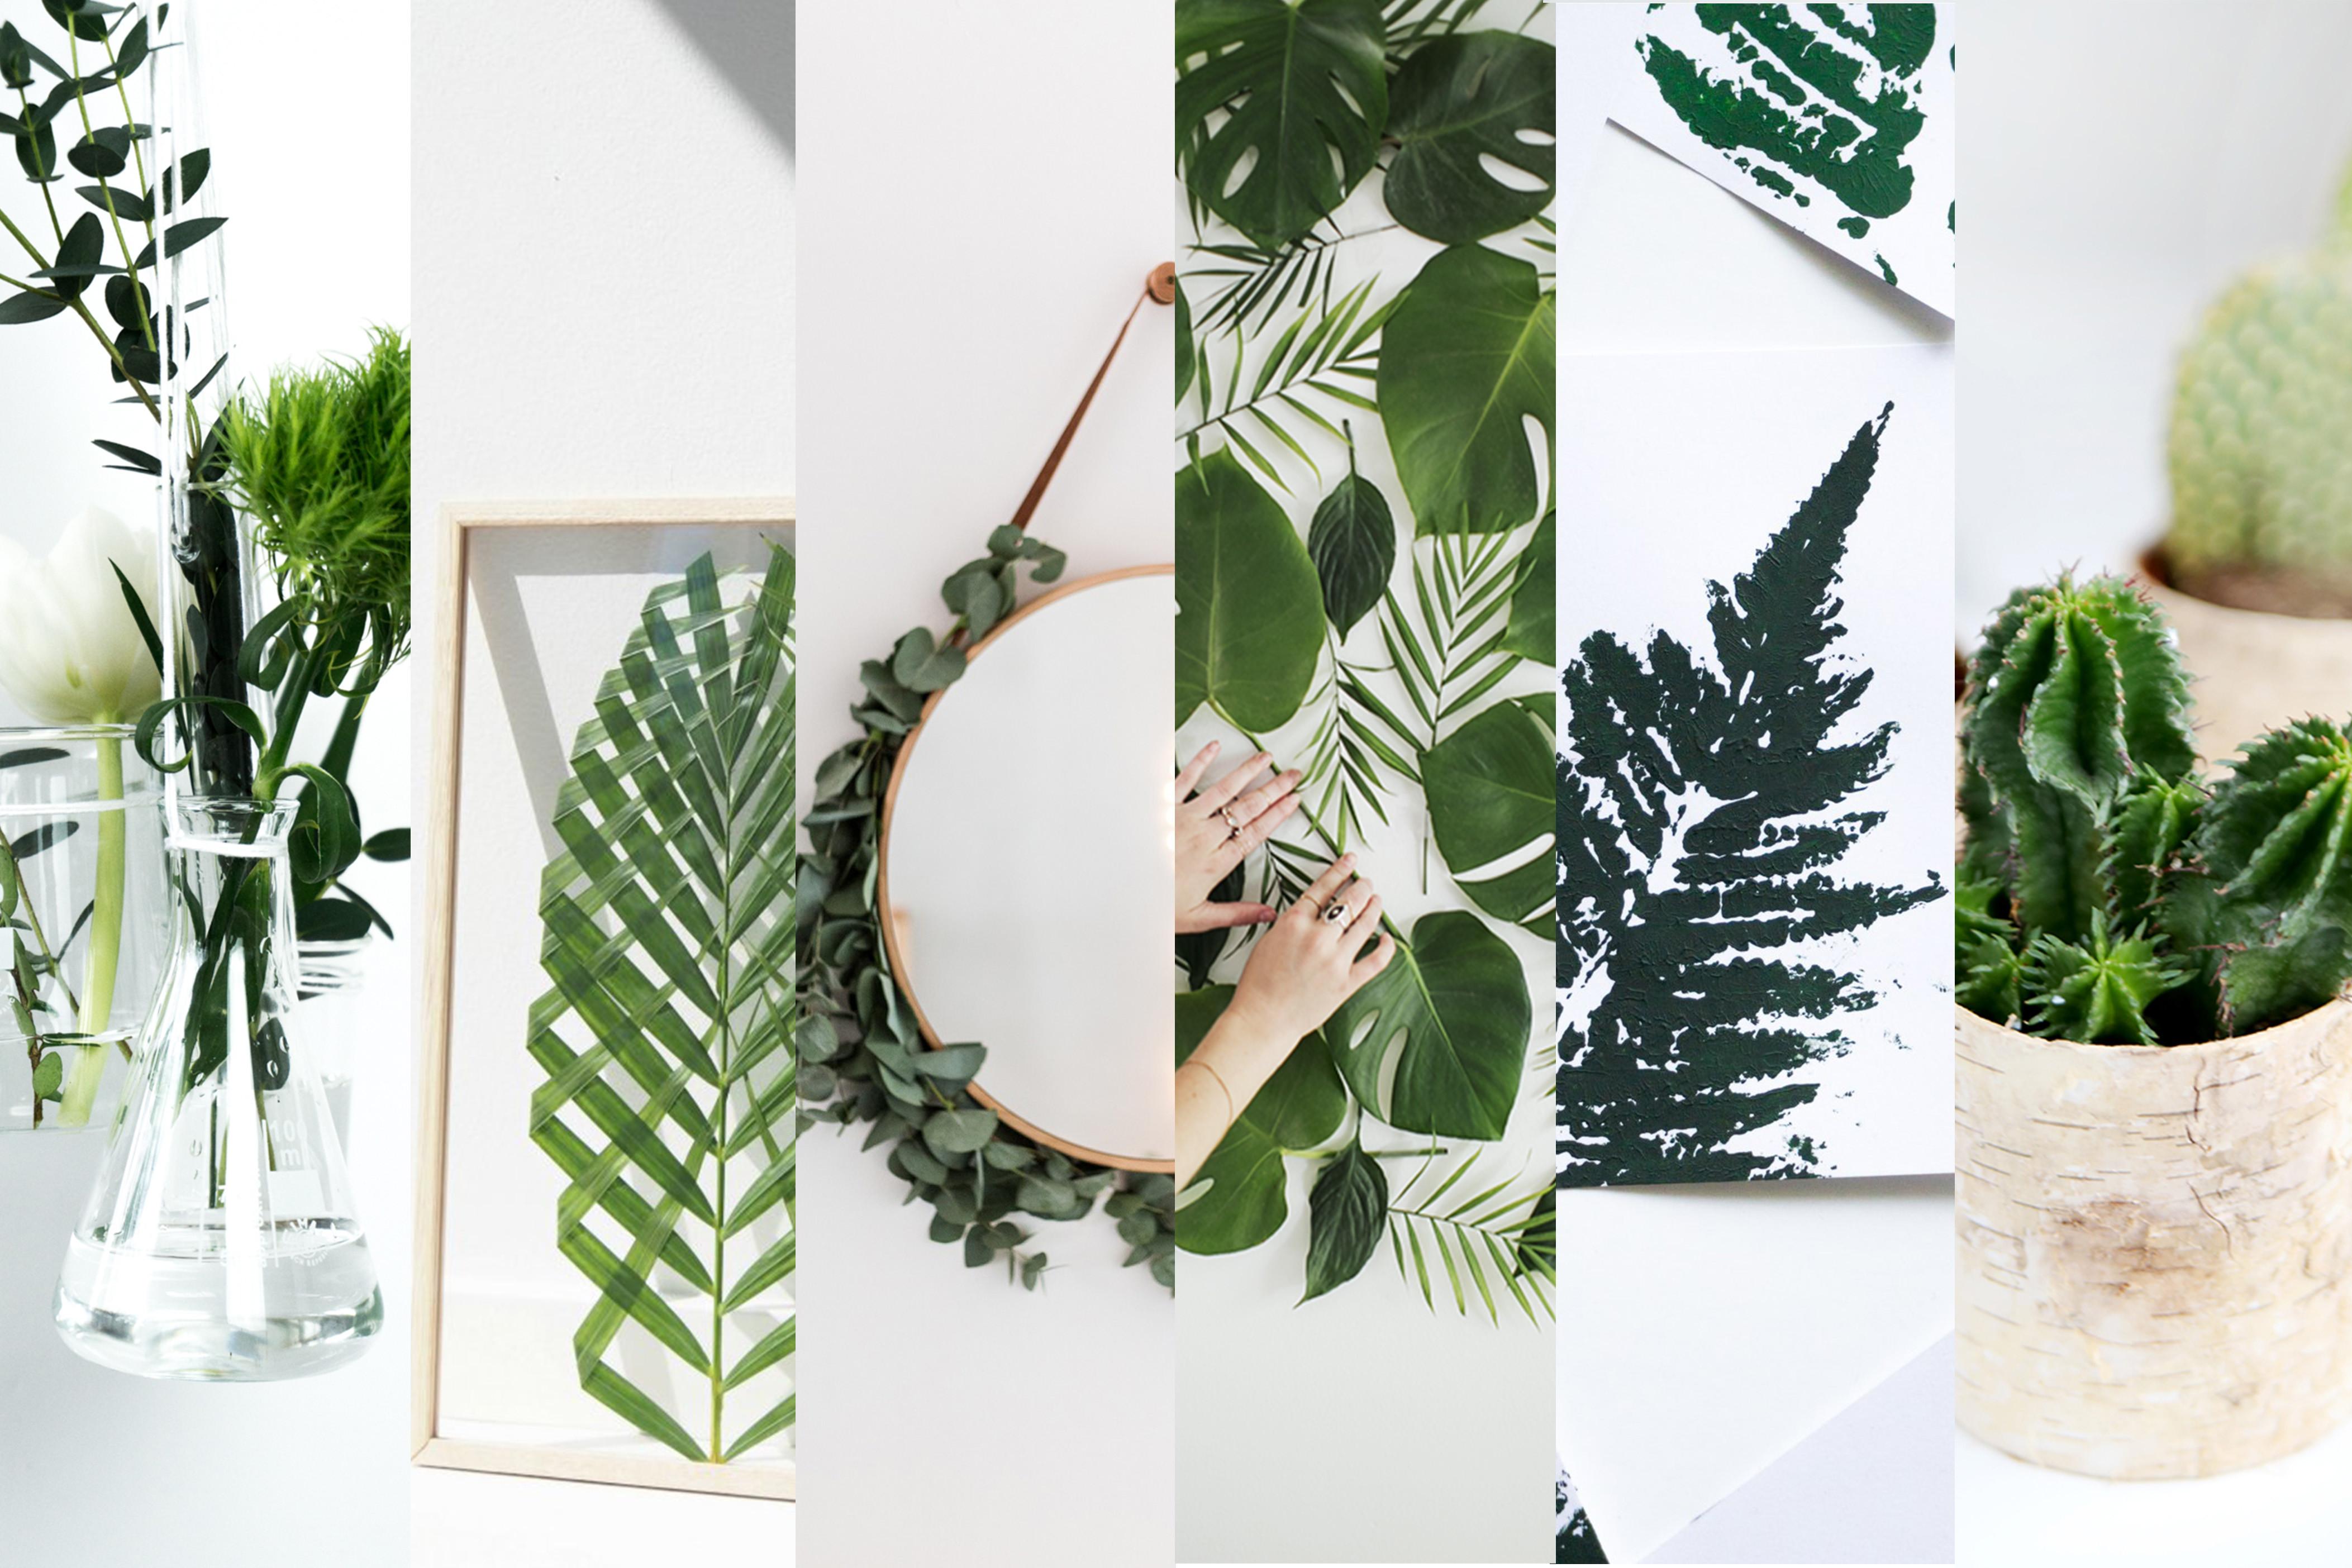 Diy Deko Ideen  6 kreative Ideen für Pflanzen Deko